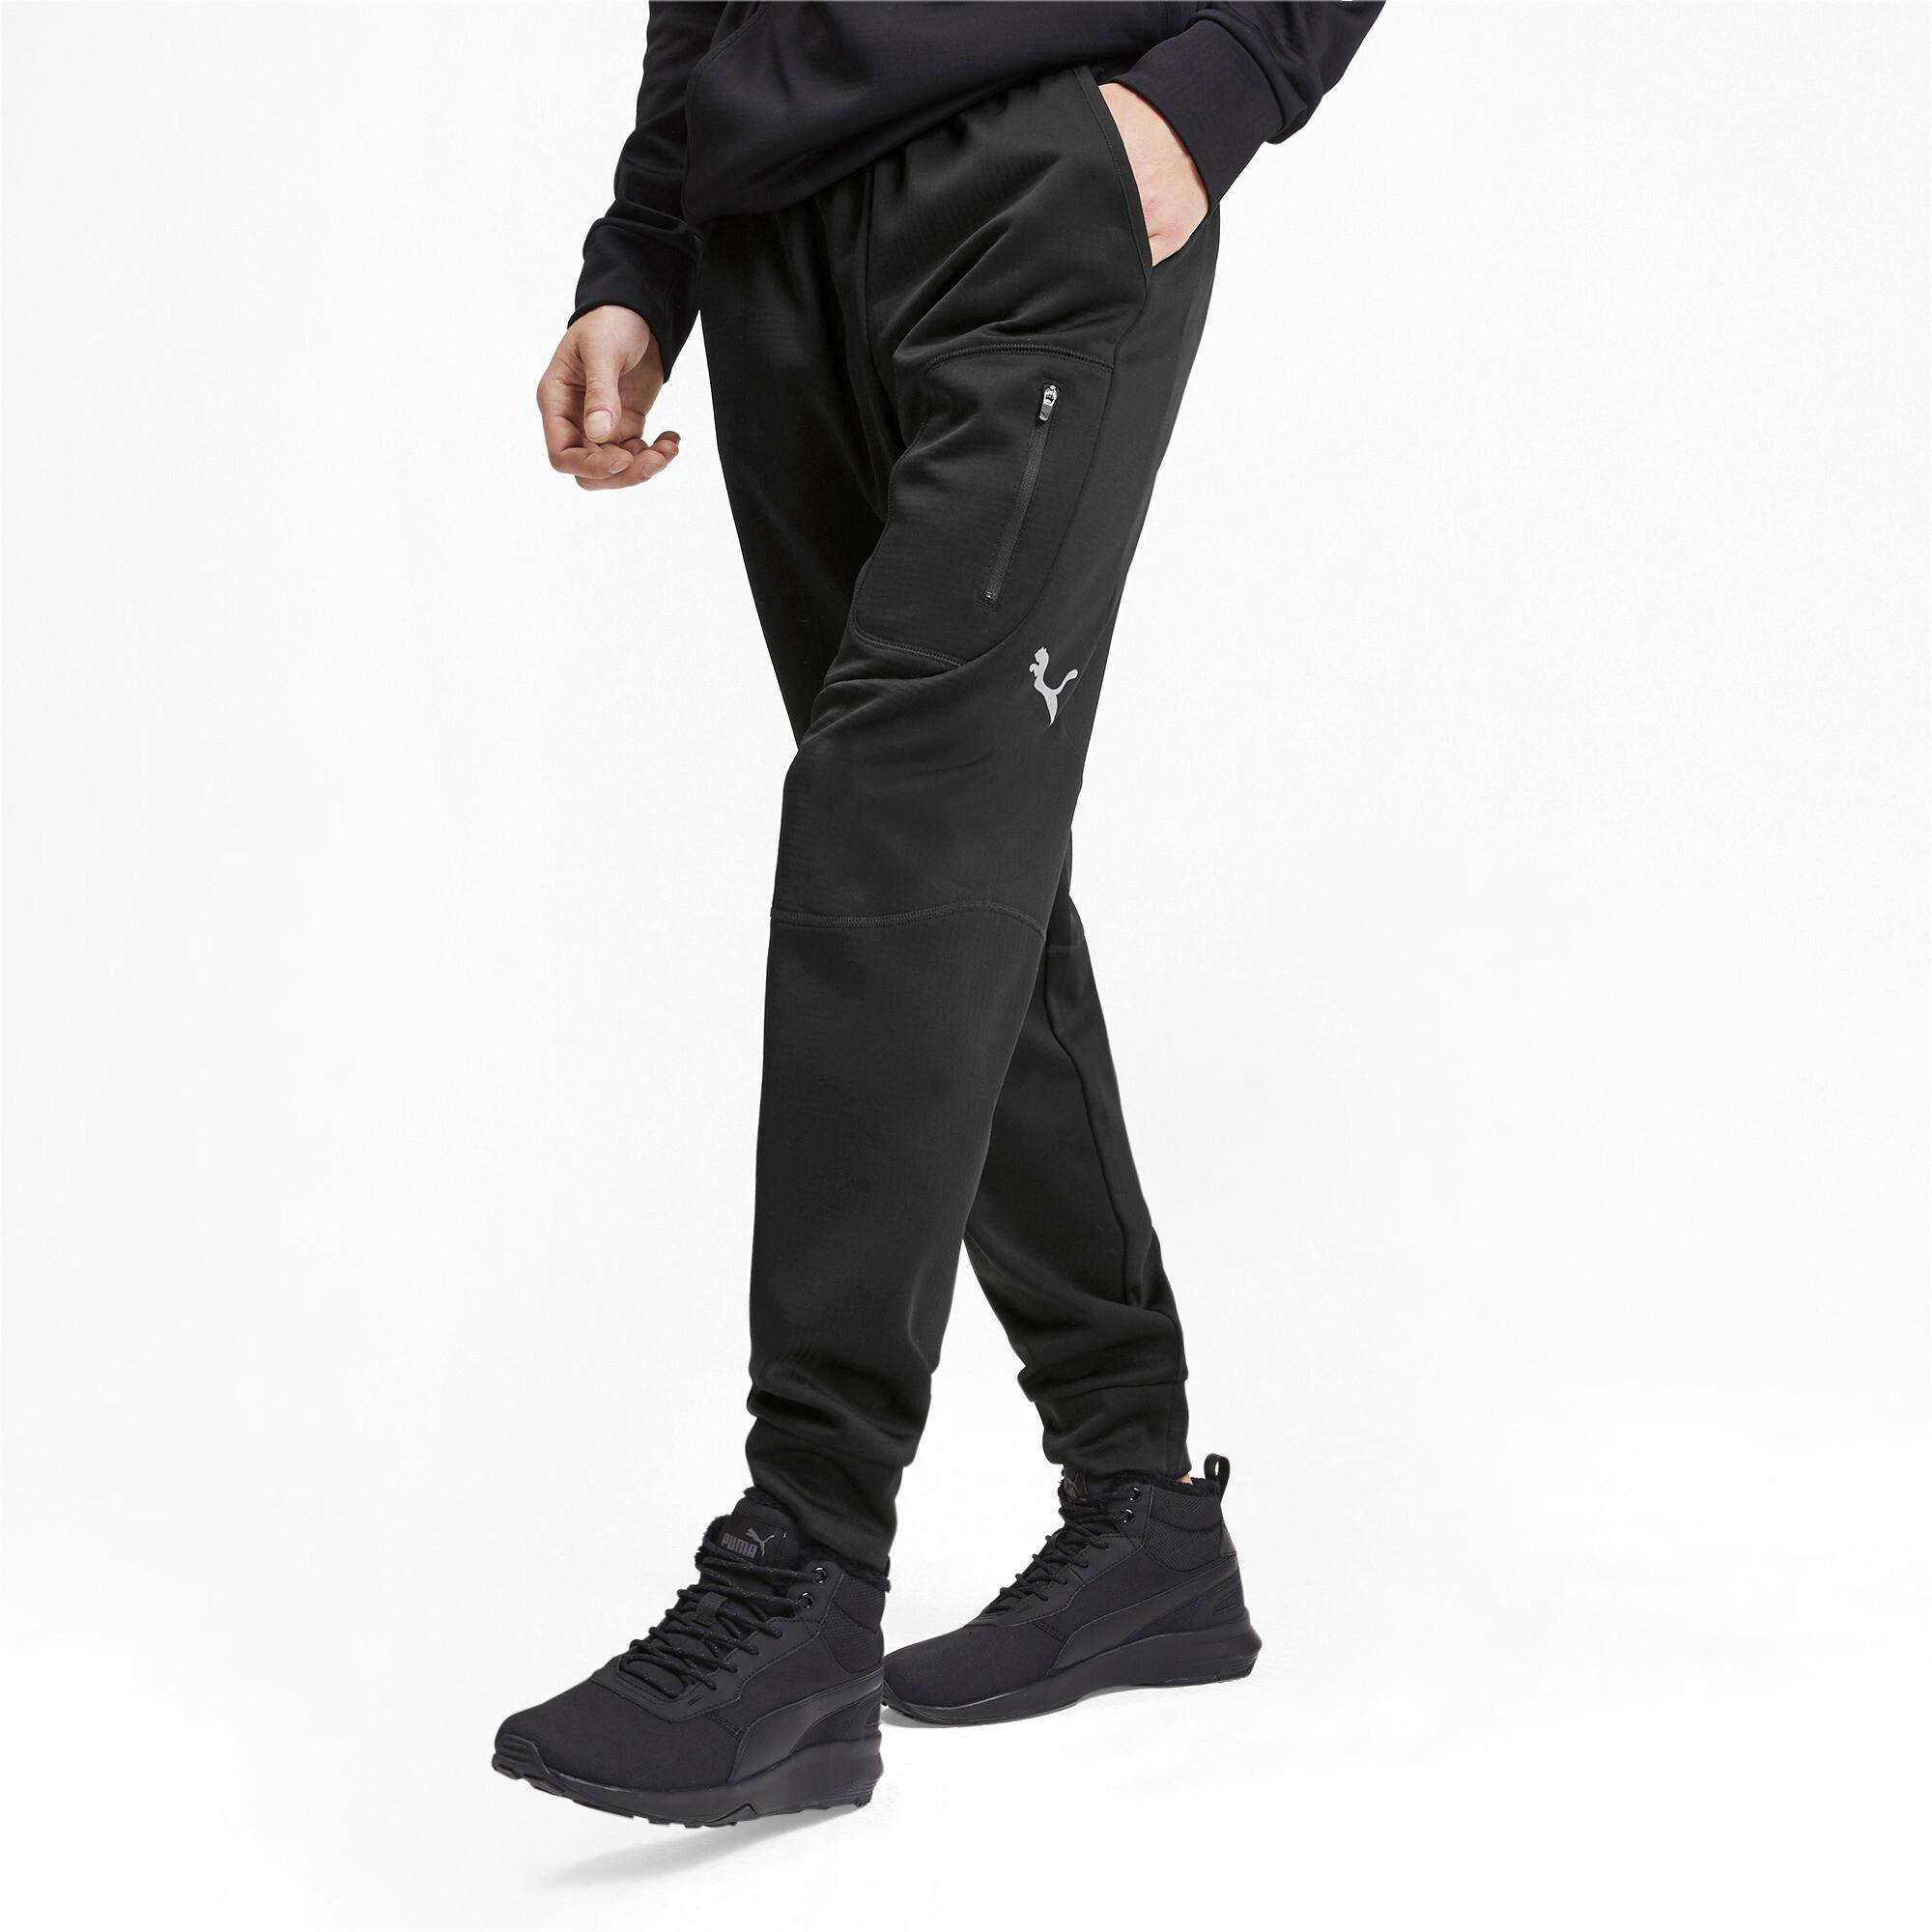 PUMA-Evostripe-Warm-Men-039-s-Pants-Men-Knitted-Pants-Basics miniatura 9